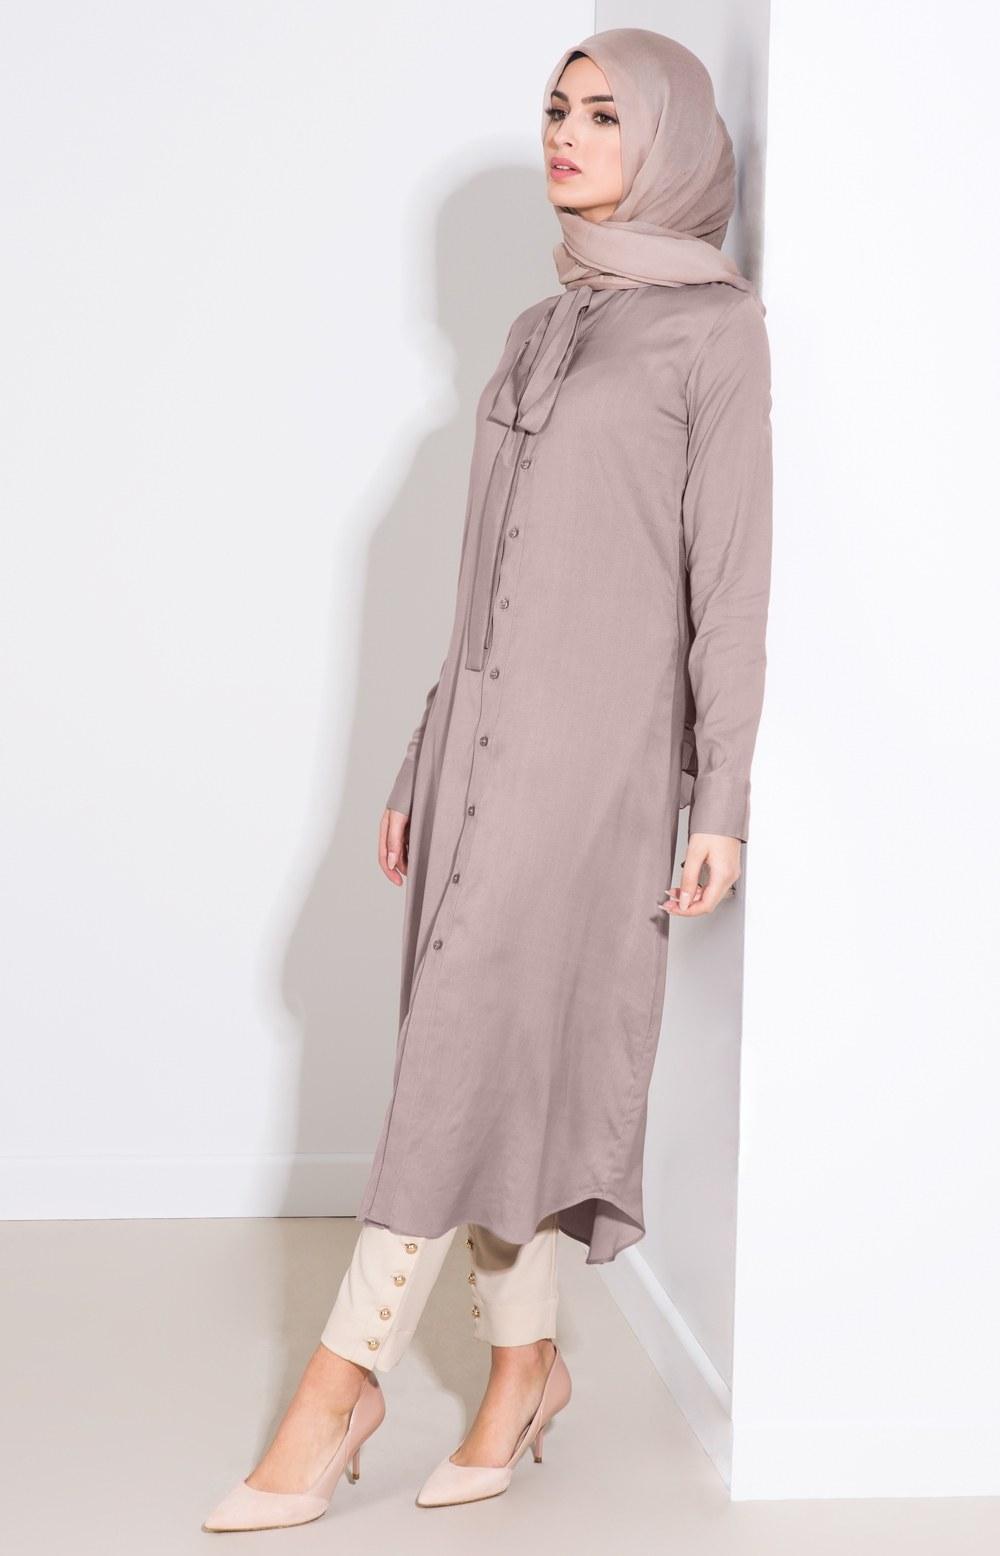 Ide Model Baju Lebaran Baru Xtd6 25 Trend Model Baju Muslim Lebaran 2018 Simple & Modis